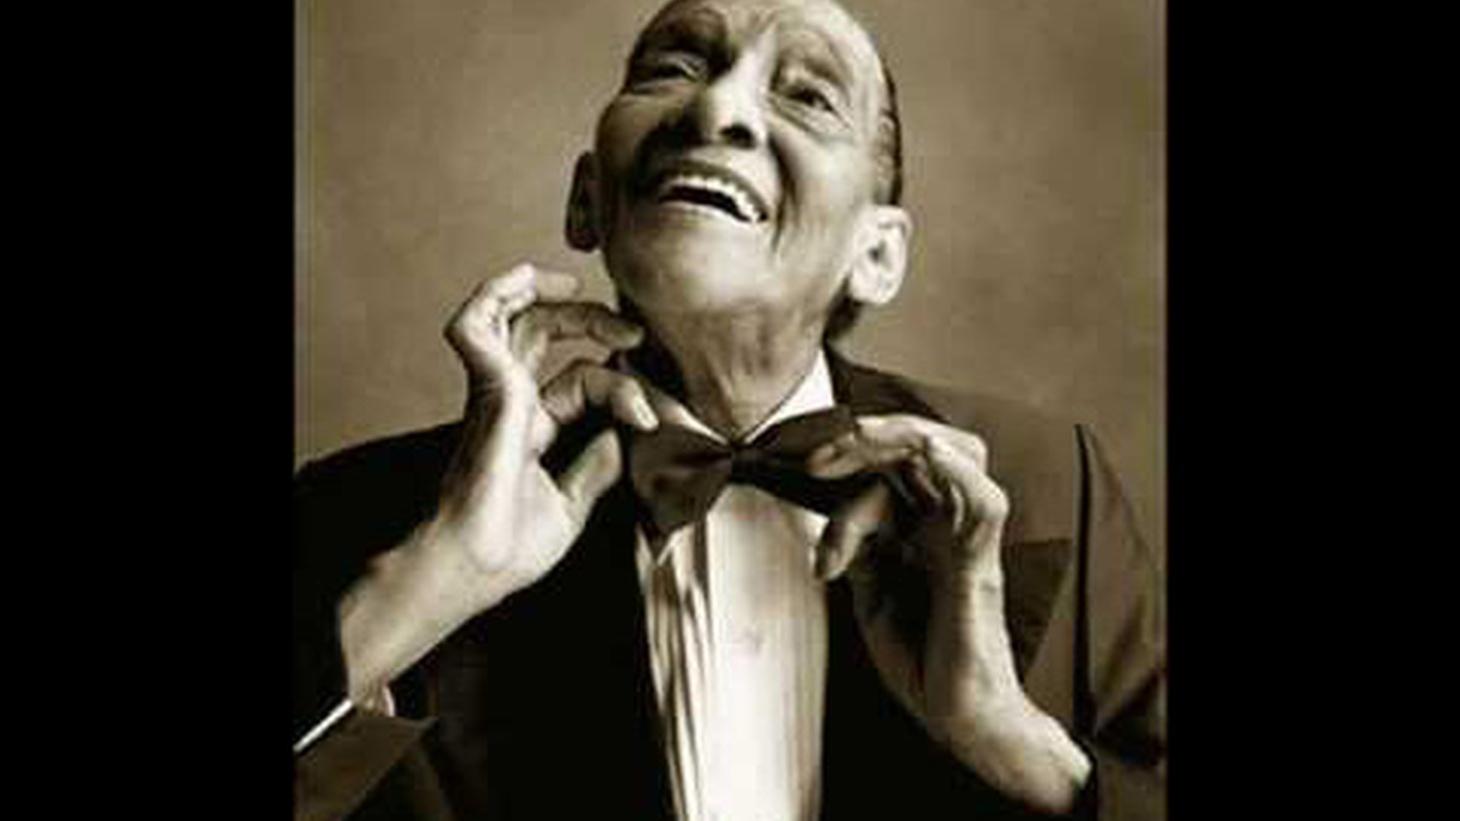 KCRW DJ Chris Douridas pays tribute to the late jazz vocalist Little Jimmy Scott.